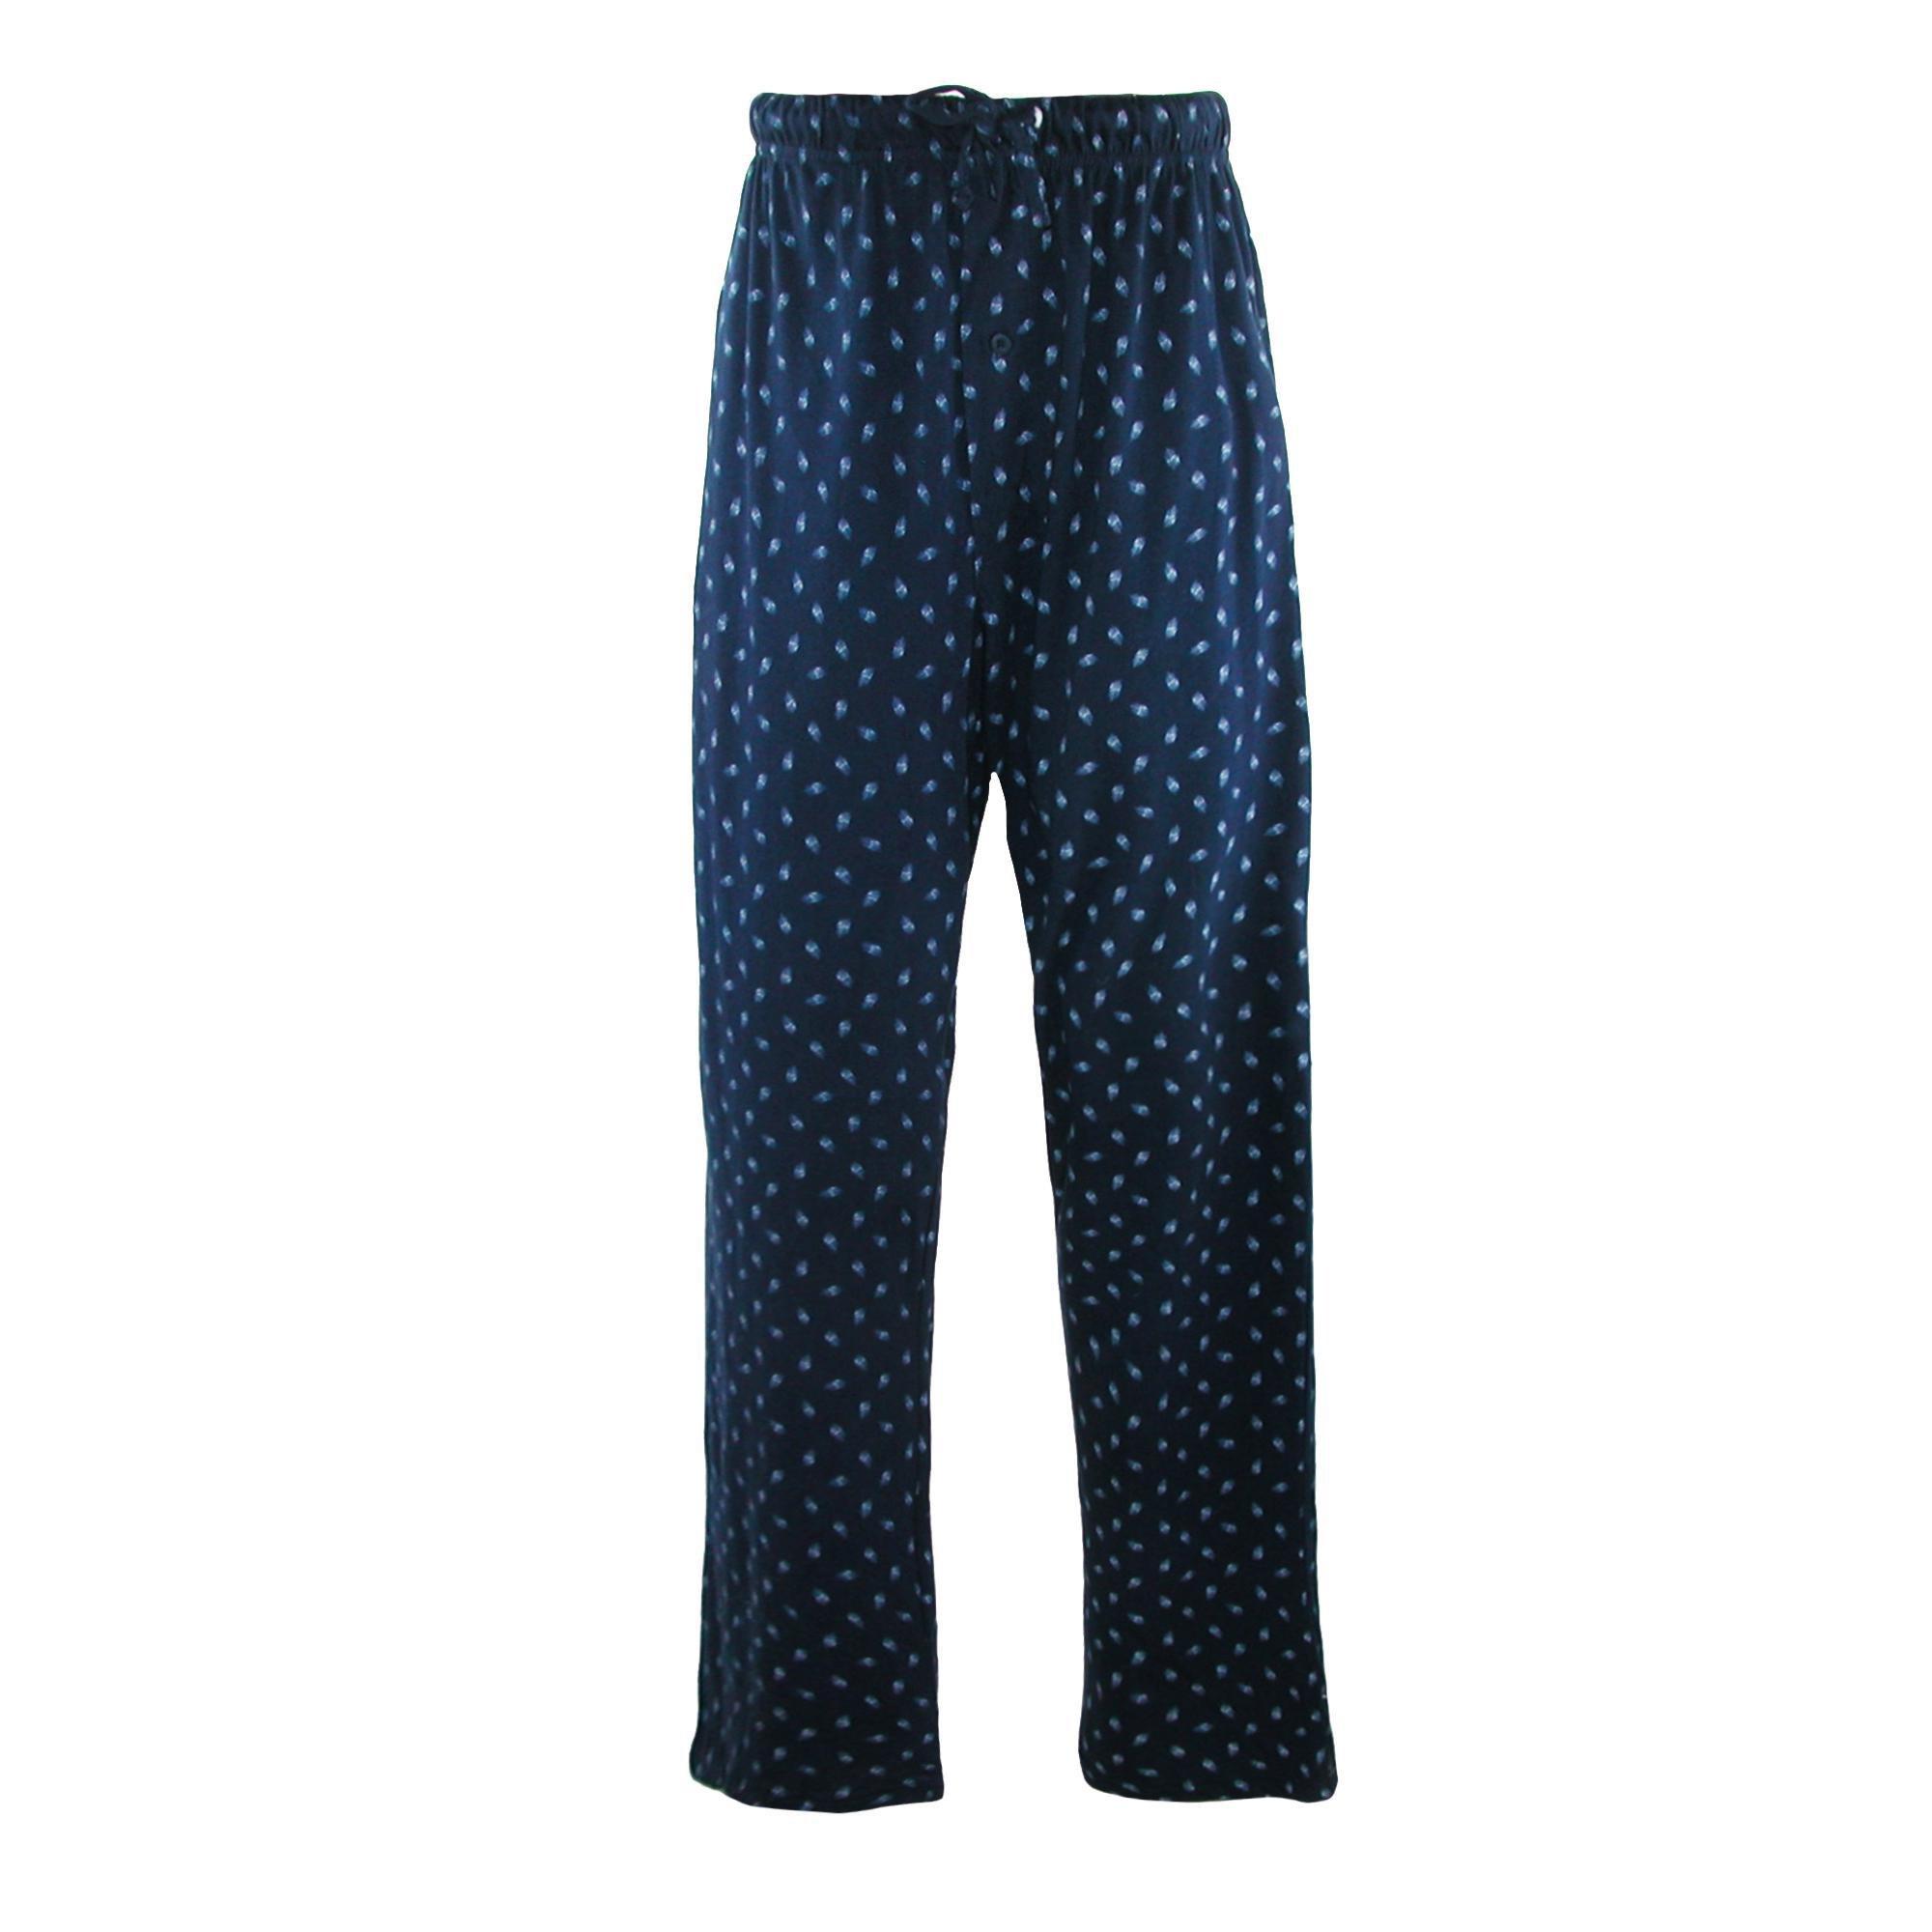 Hanes Men's Cotton ComfortSoft Printed Knit Pants, XLarge, Light Blue